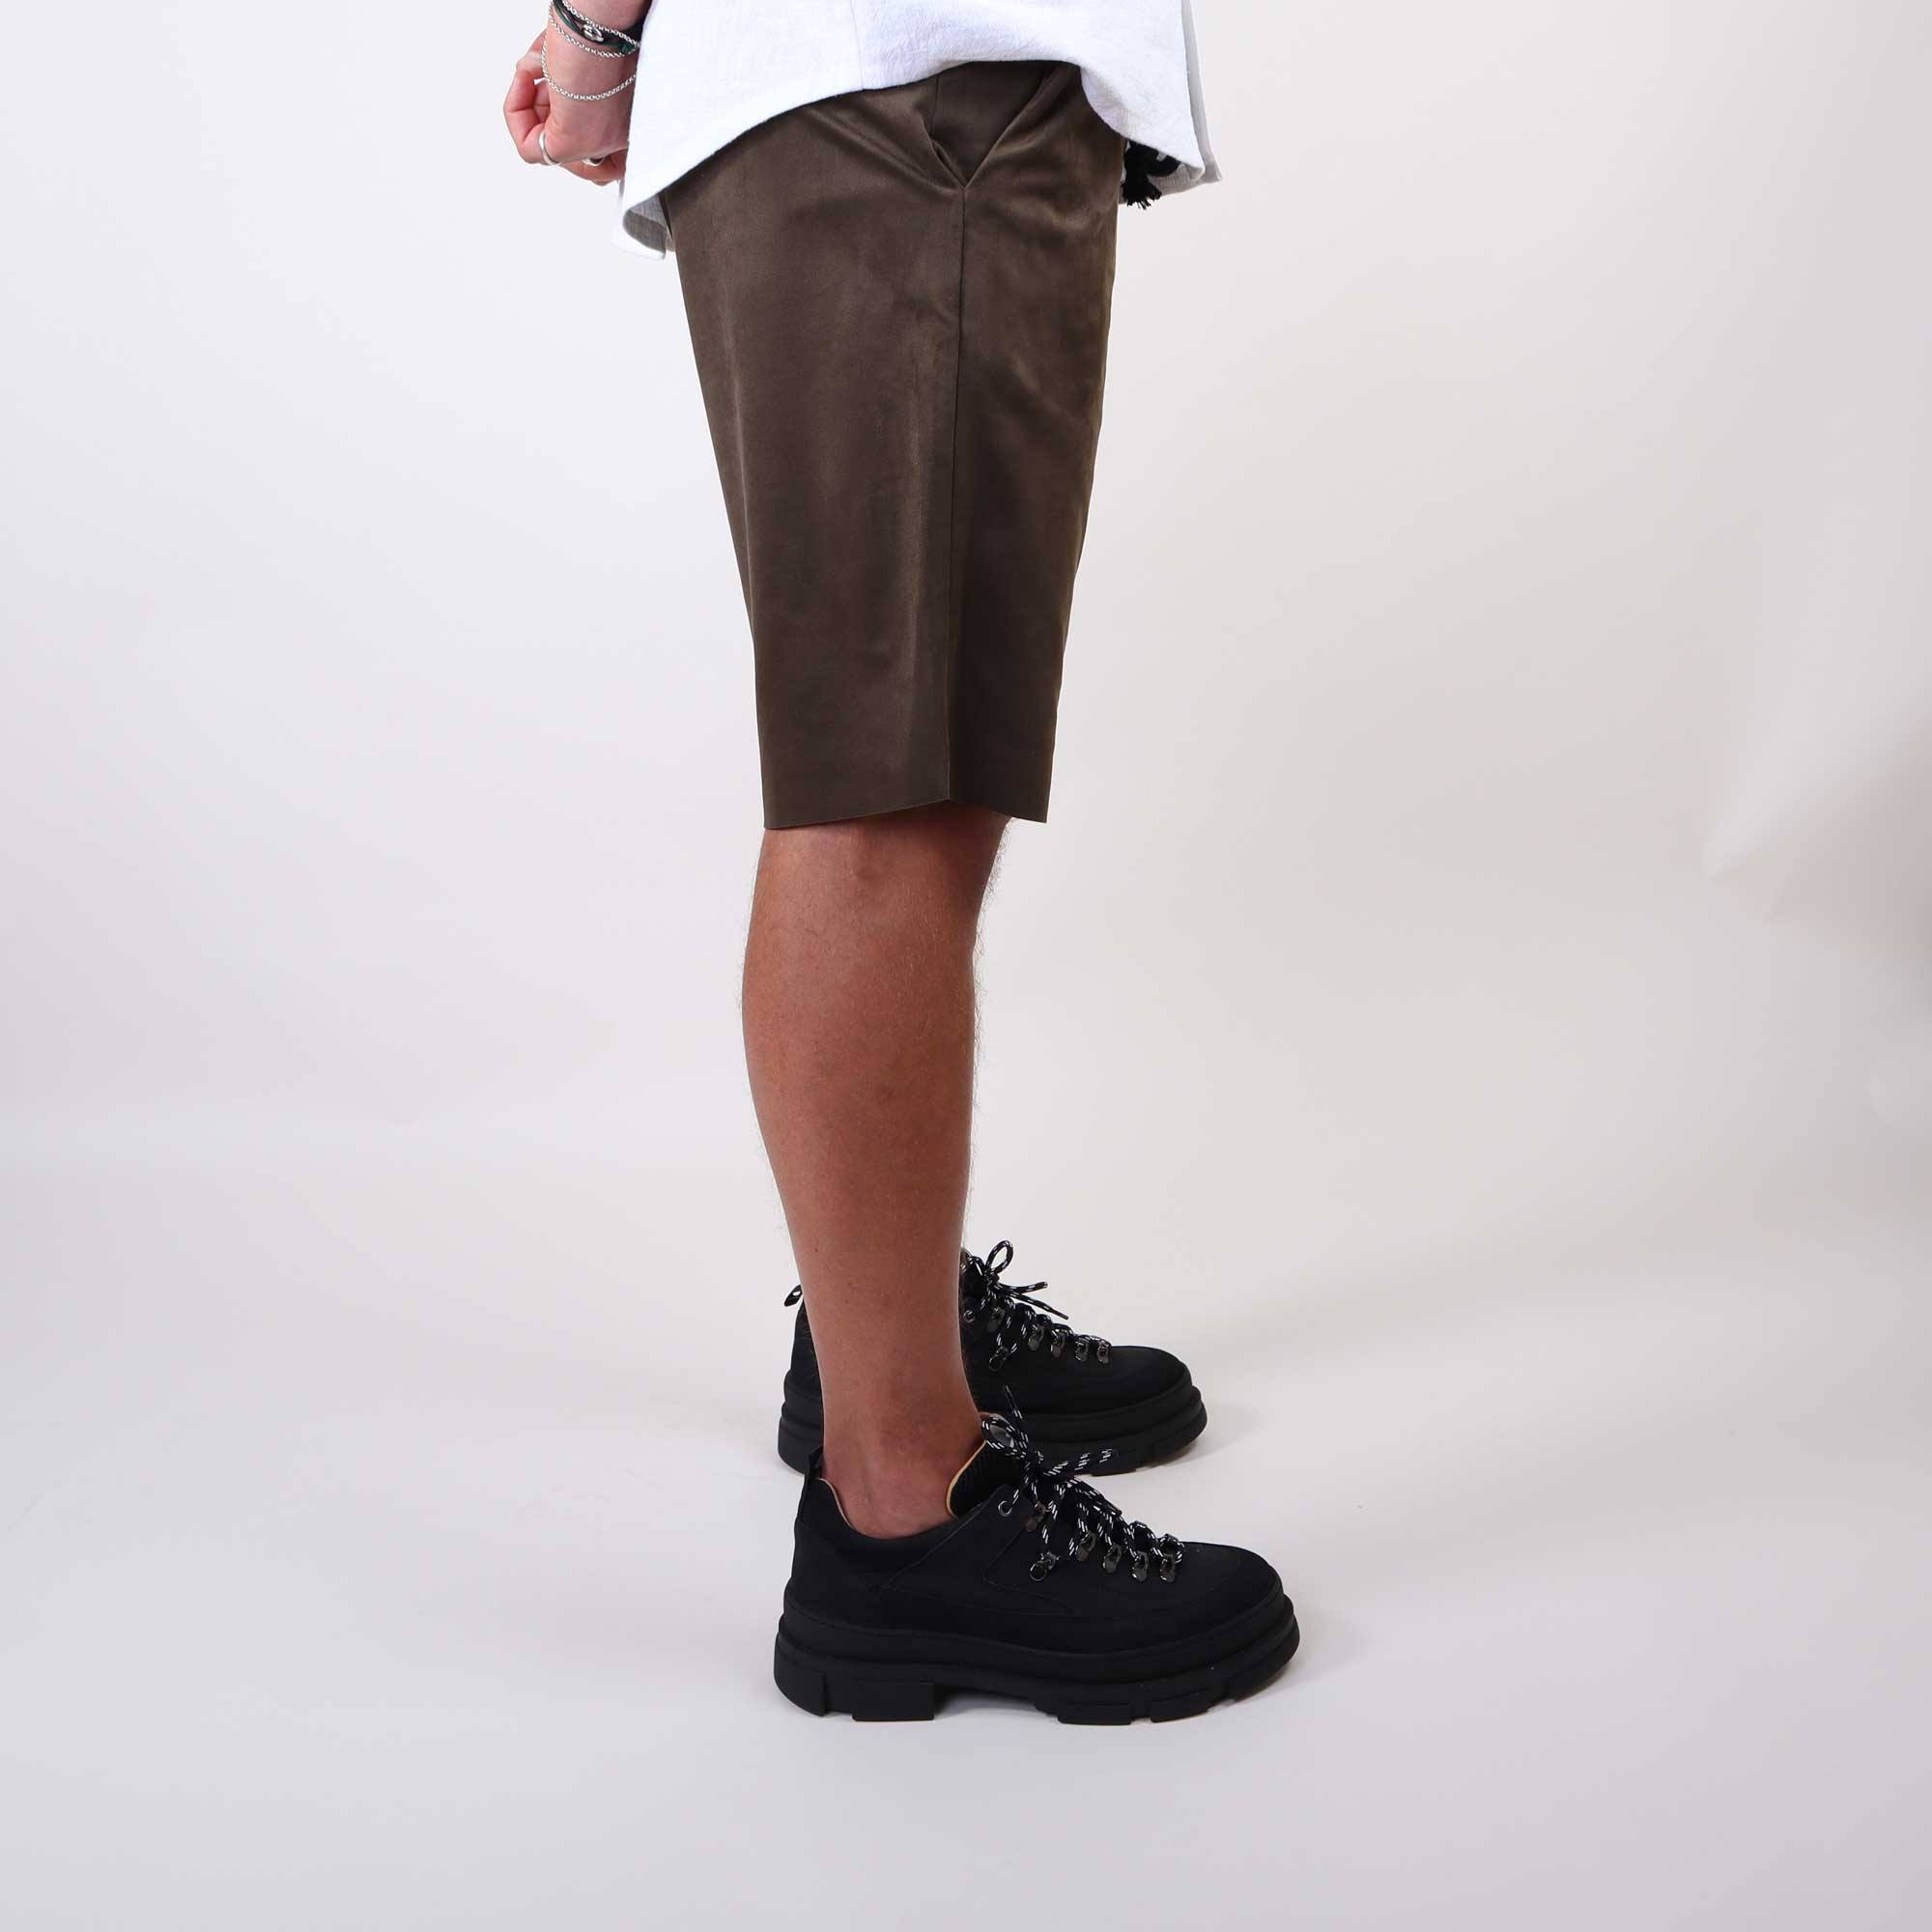 shorts-suede-forrest-1